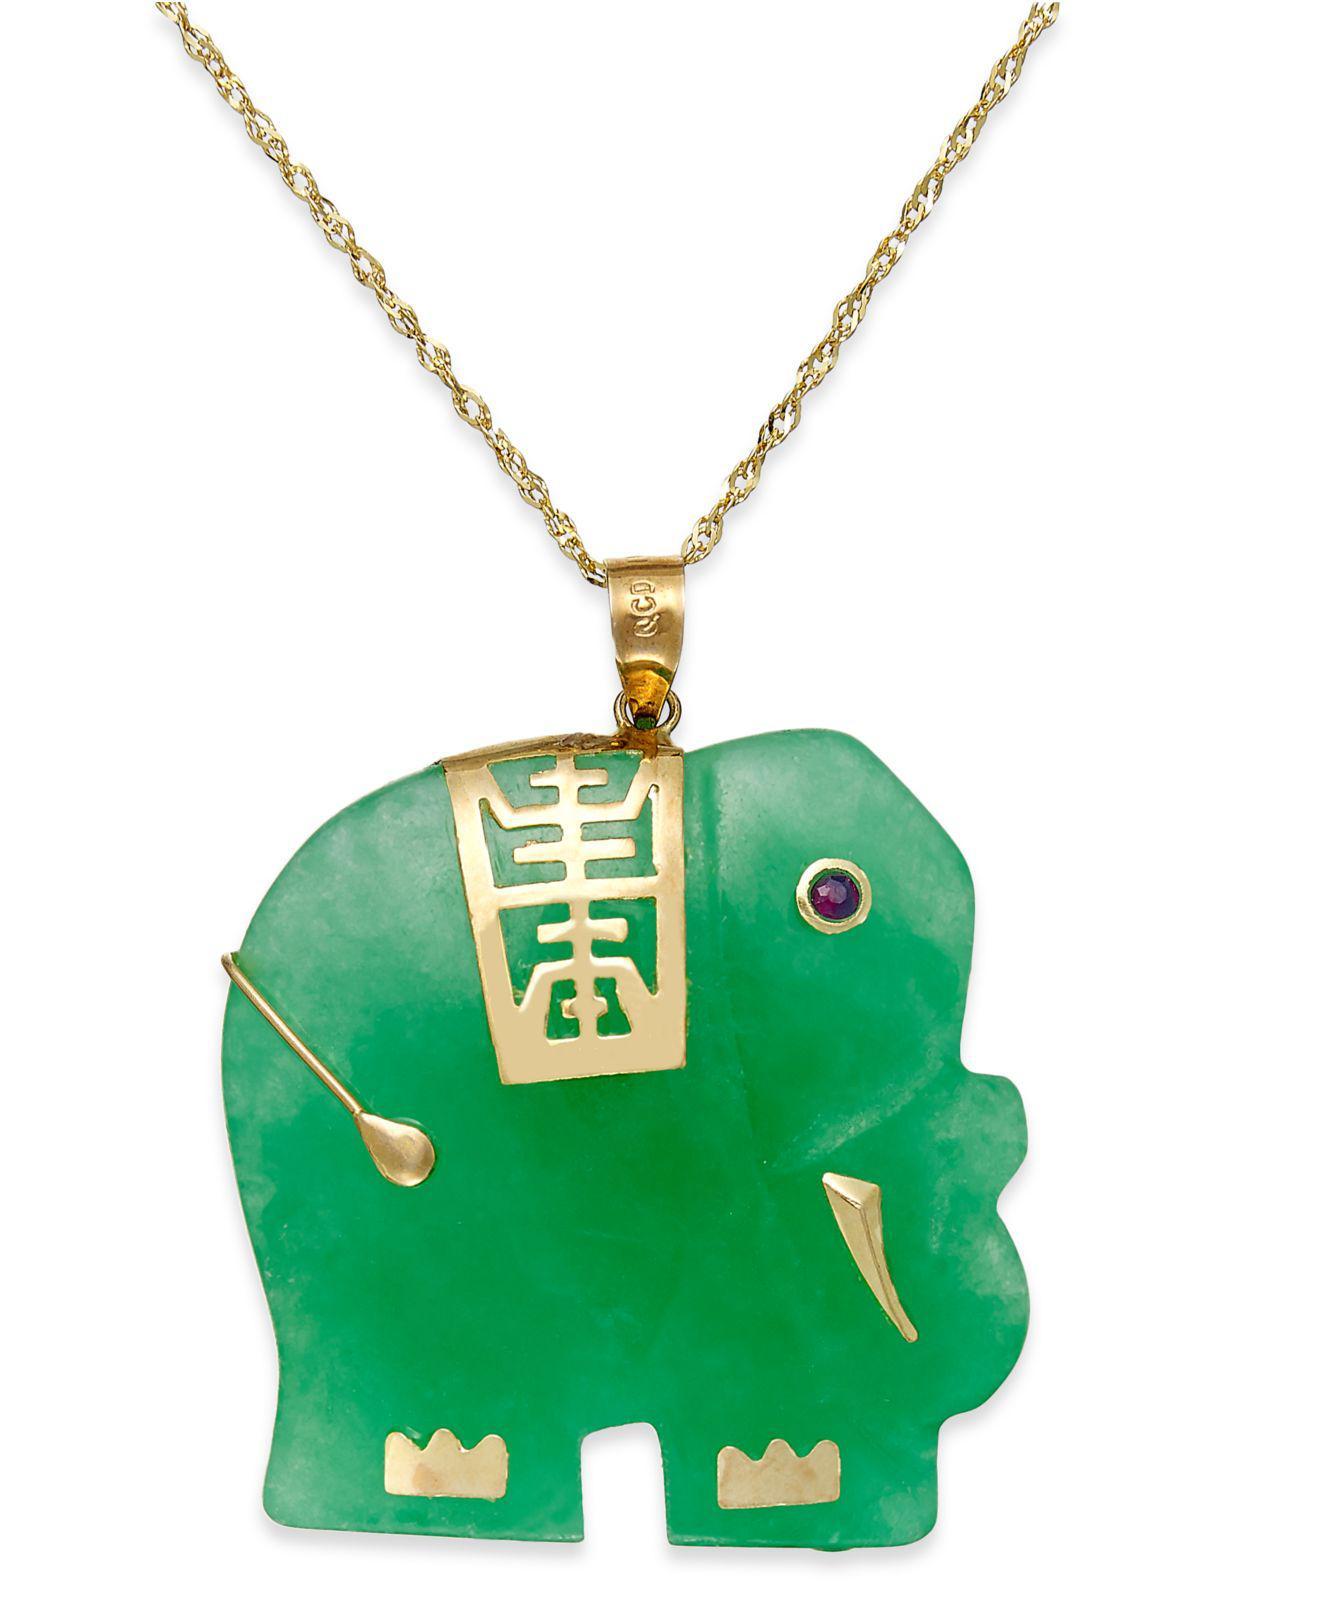 Lyst macys dyed jade elephant pendant necklace in 14k gold 25mm macys womens green dyed jade elephant pendant necklace in 14k gold aloadofball Images